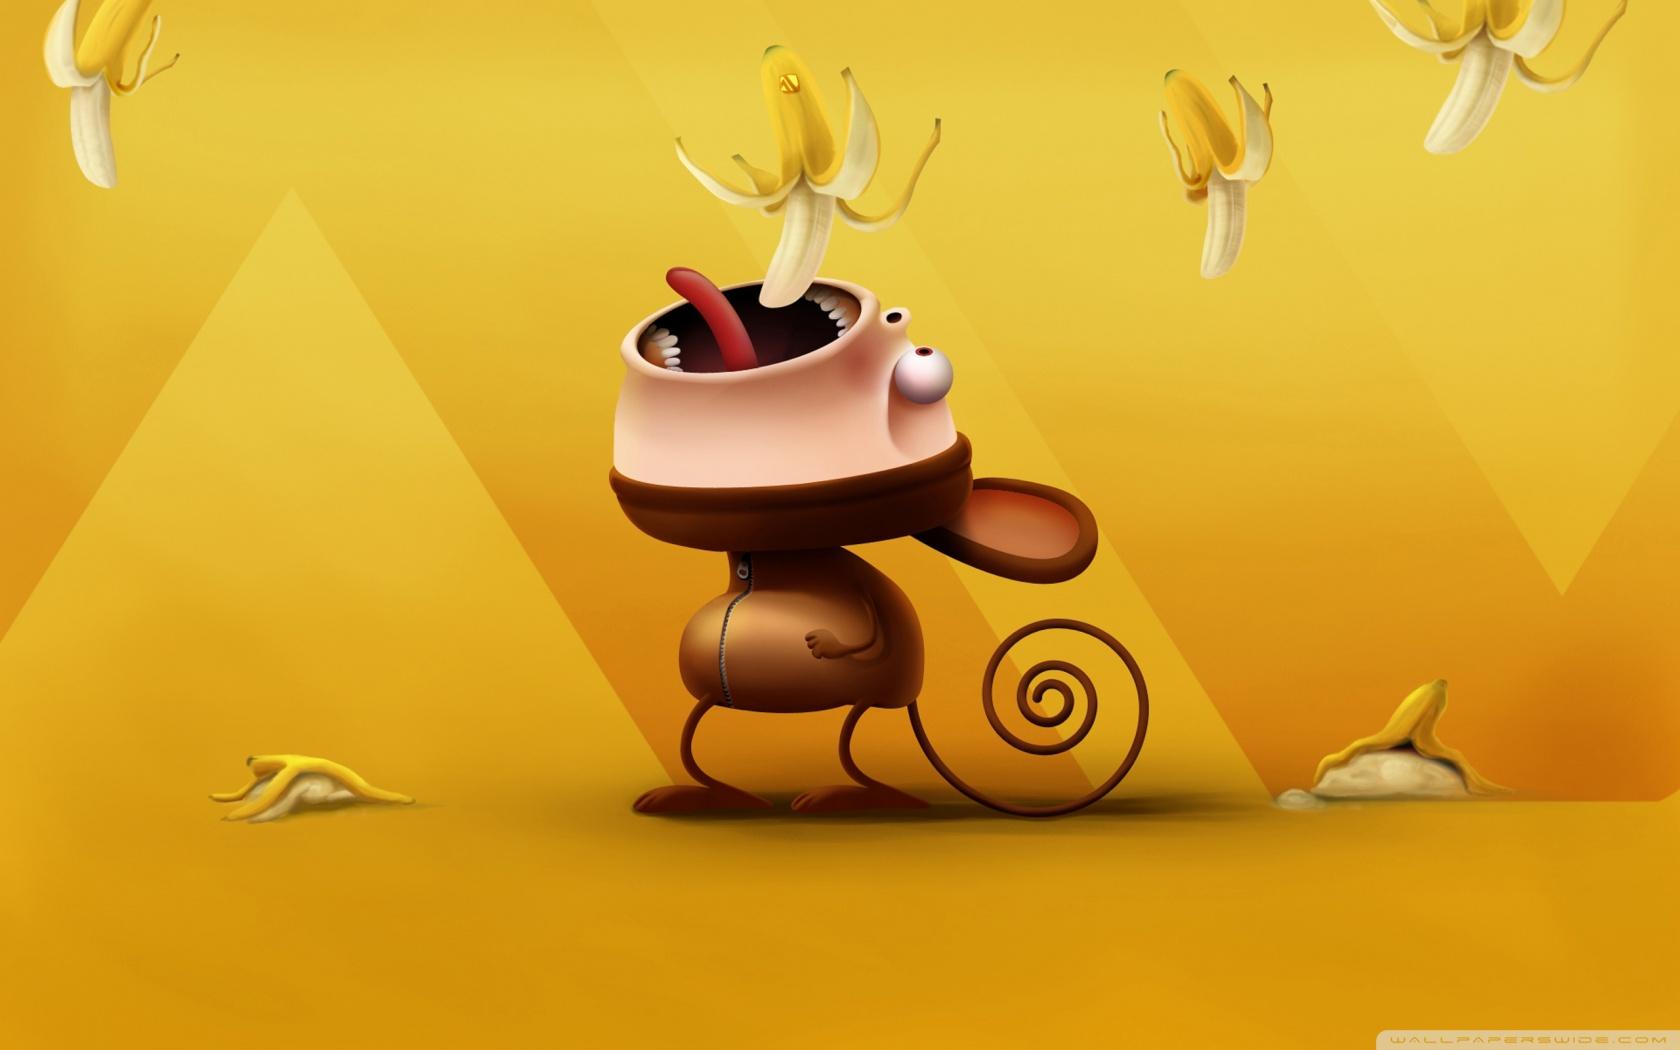 funny monkey eating bananas ❤ uhd desktop wallpaper for ultra hd